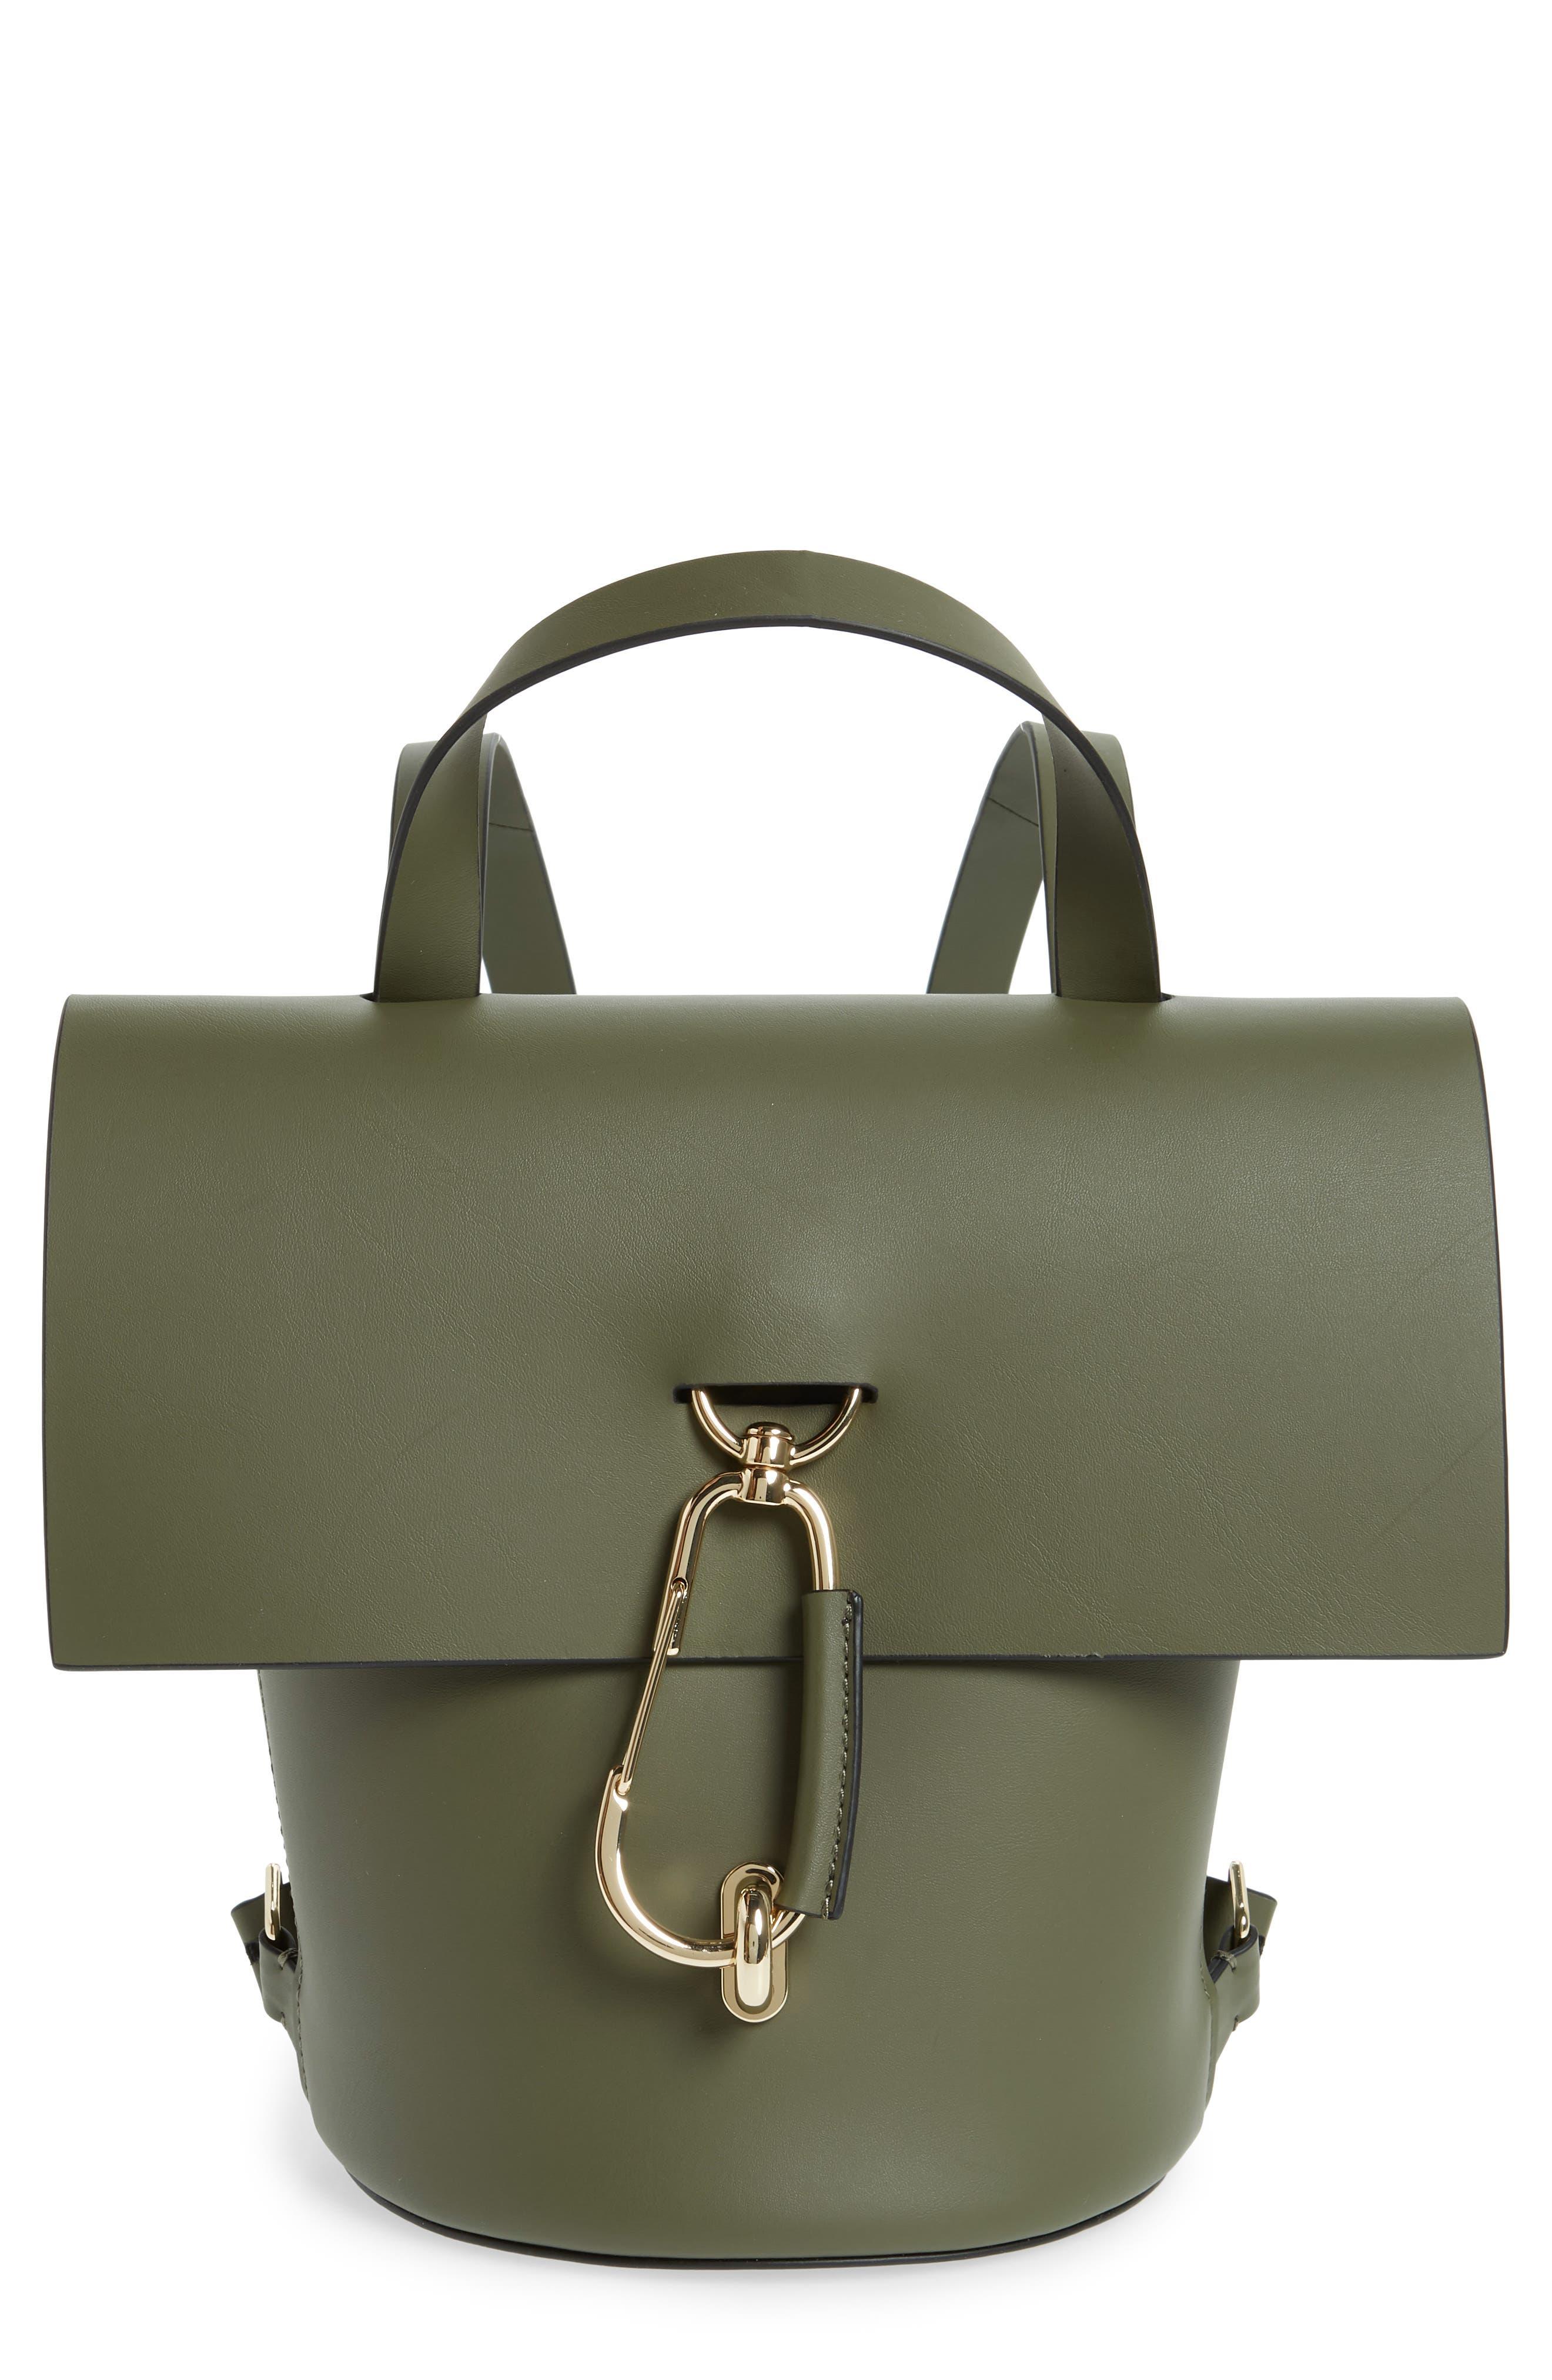 ZAC Zac Posen Belay Calfskin Leather Backpack